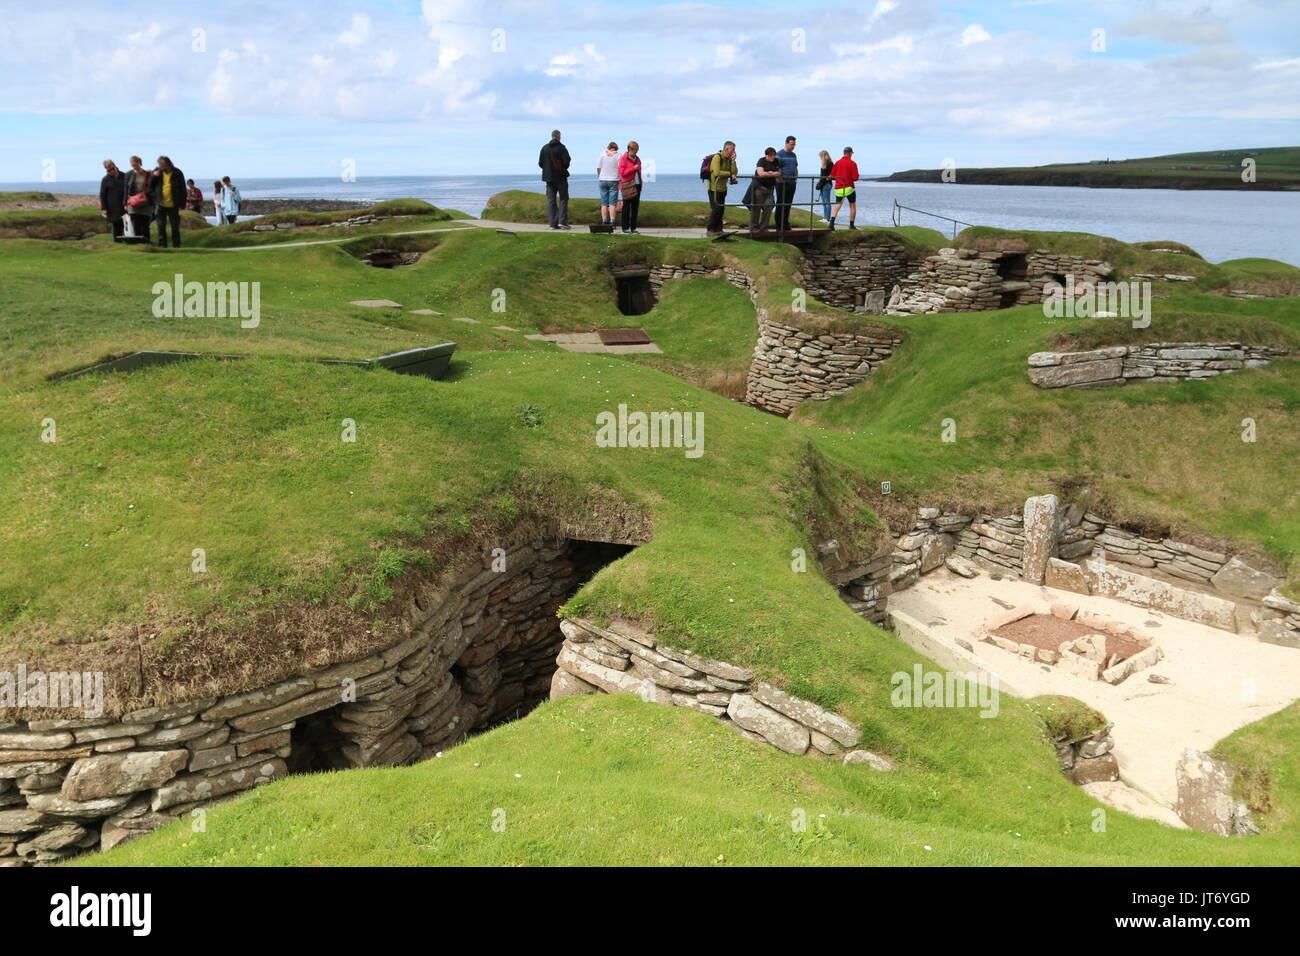 Skara Brae, Neolithic village, Orkney Islands - Stock Image